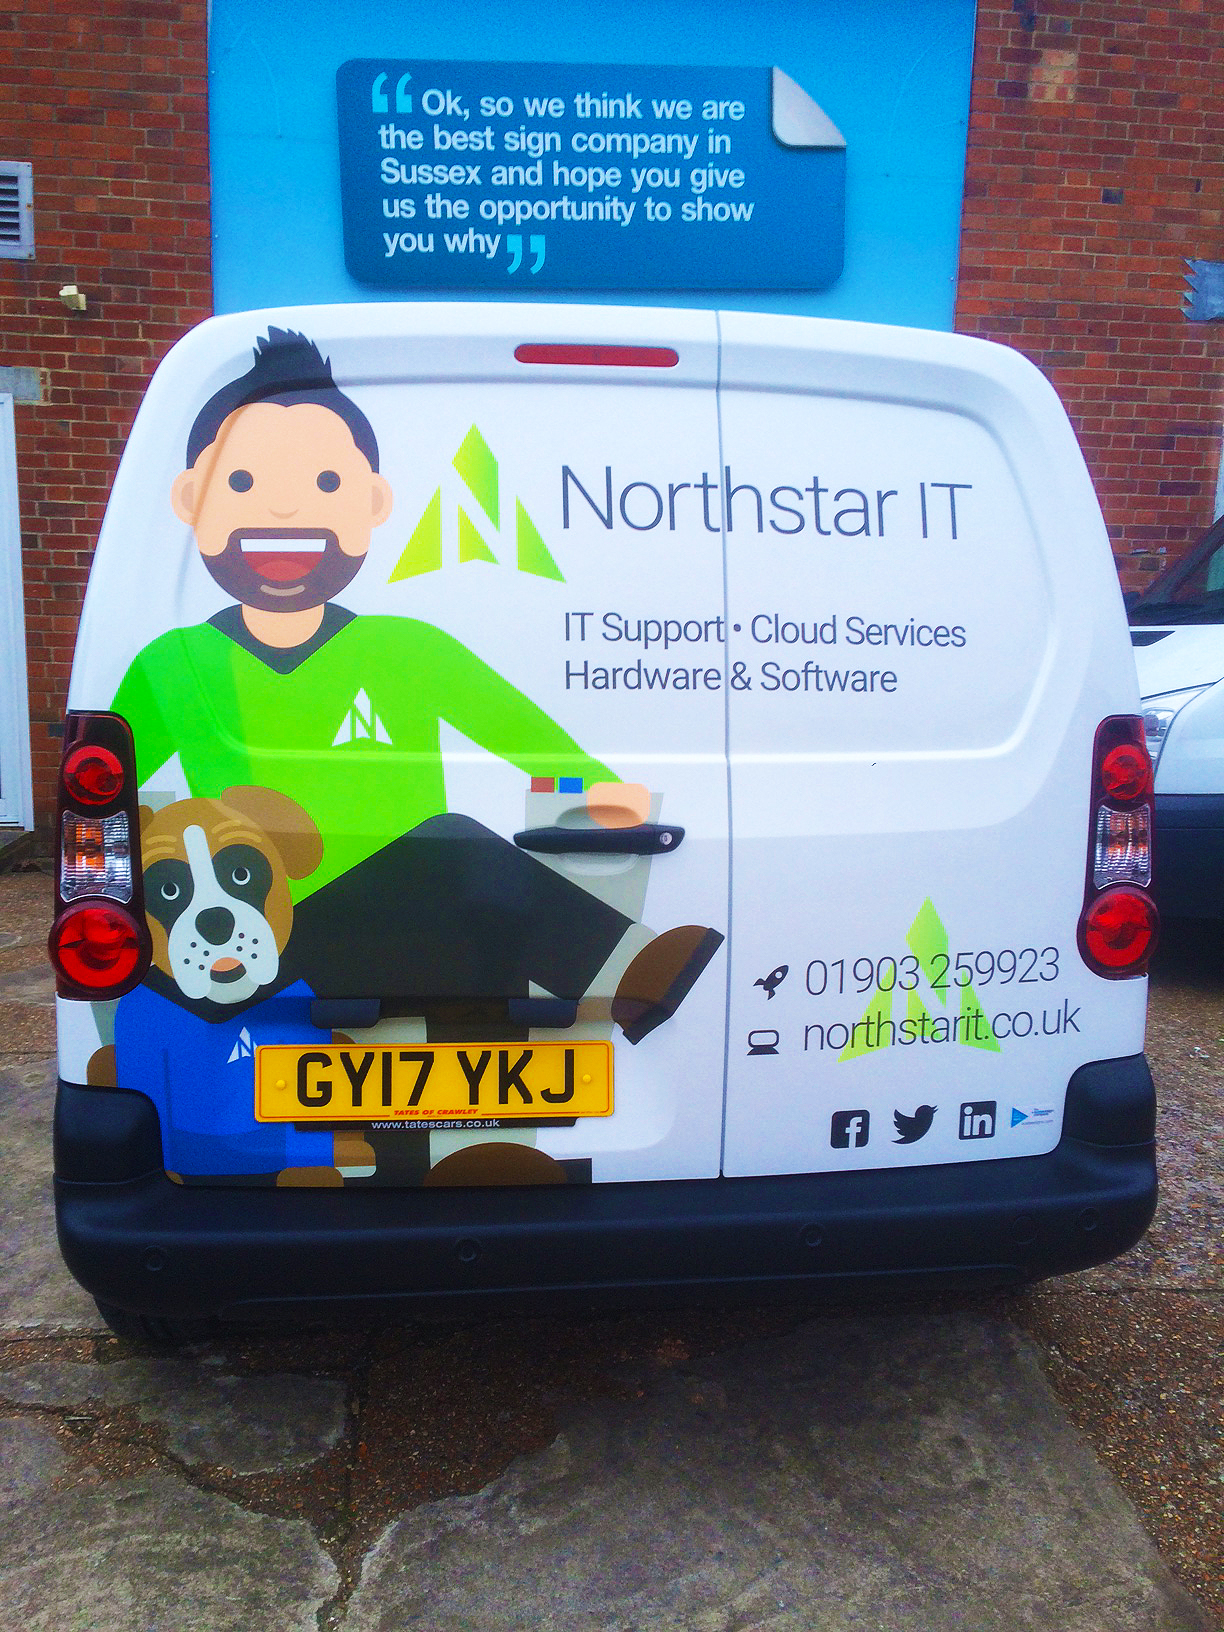 Rear view of Northstar IT van graphics